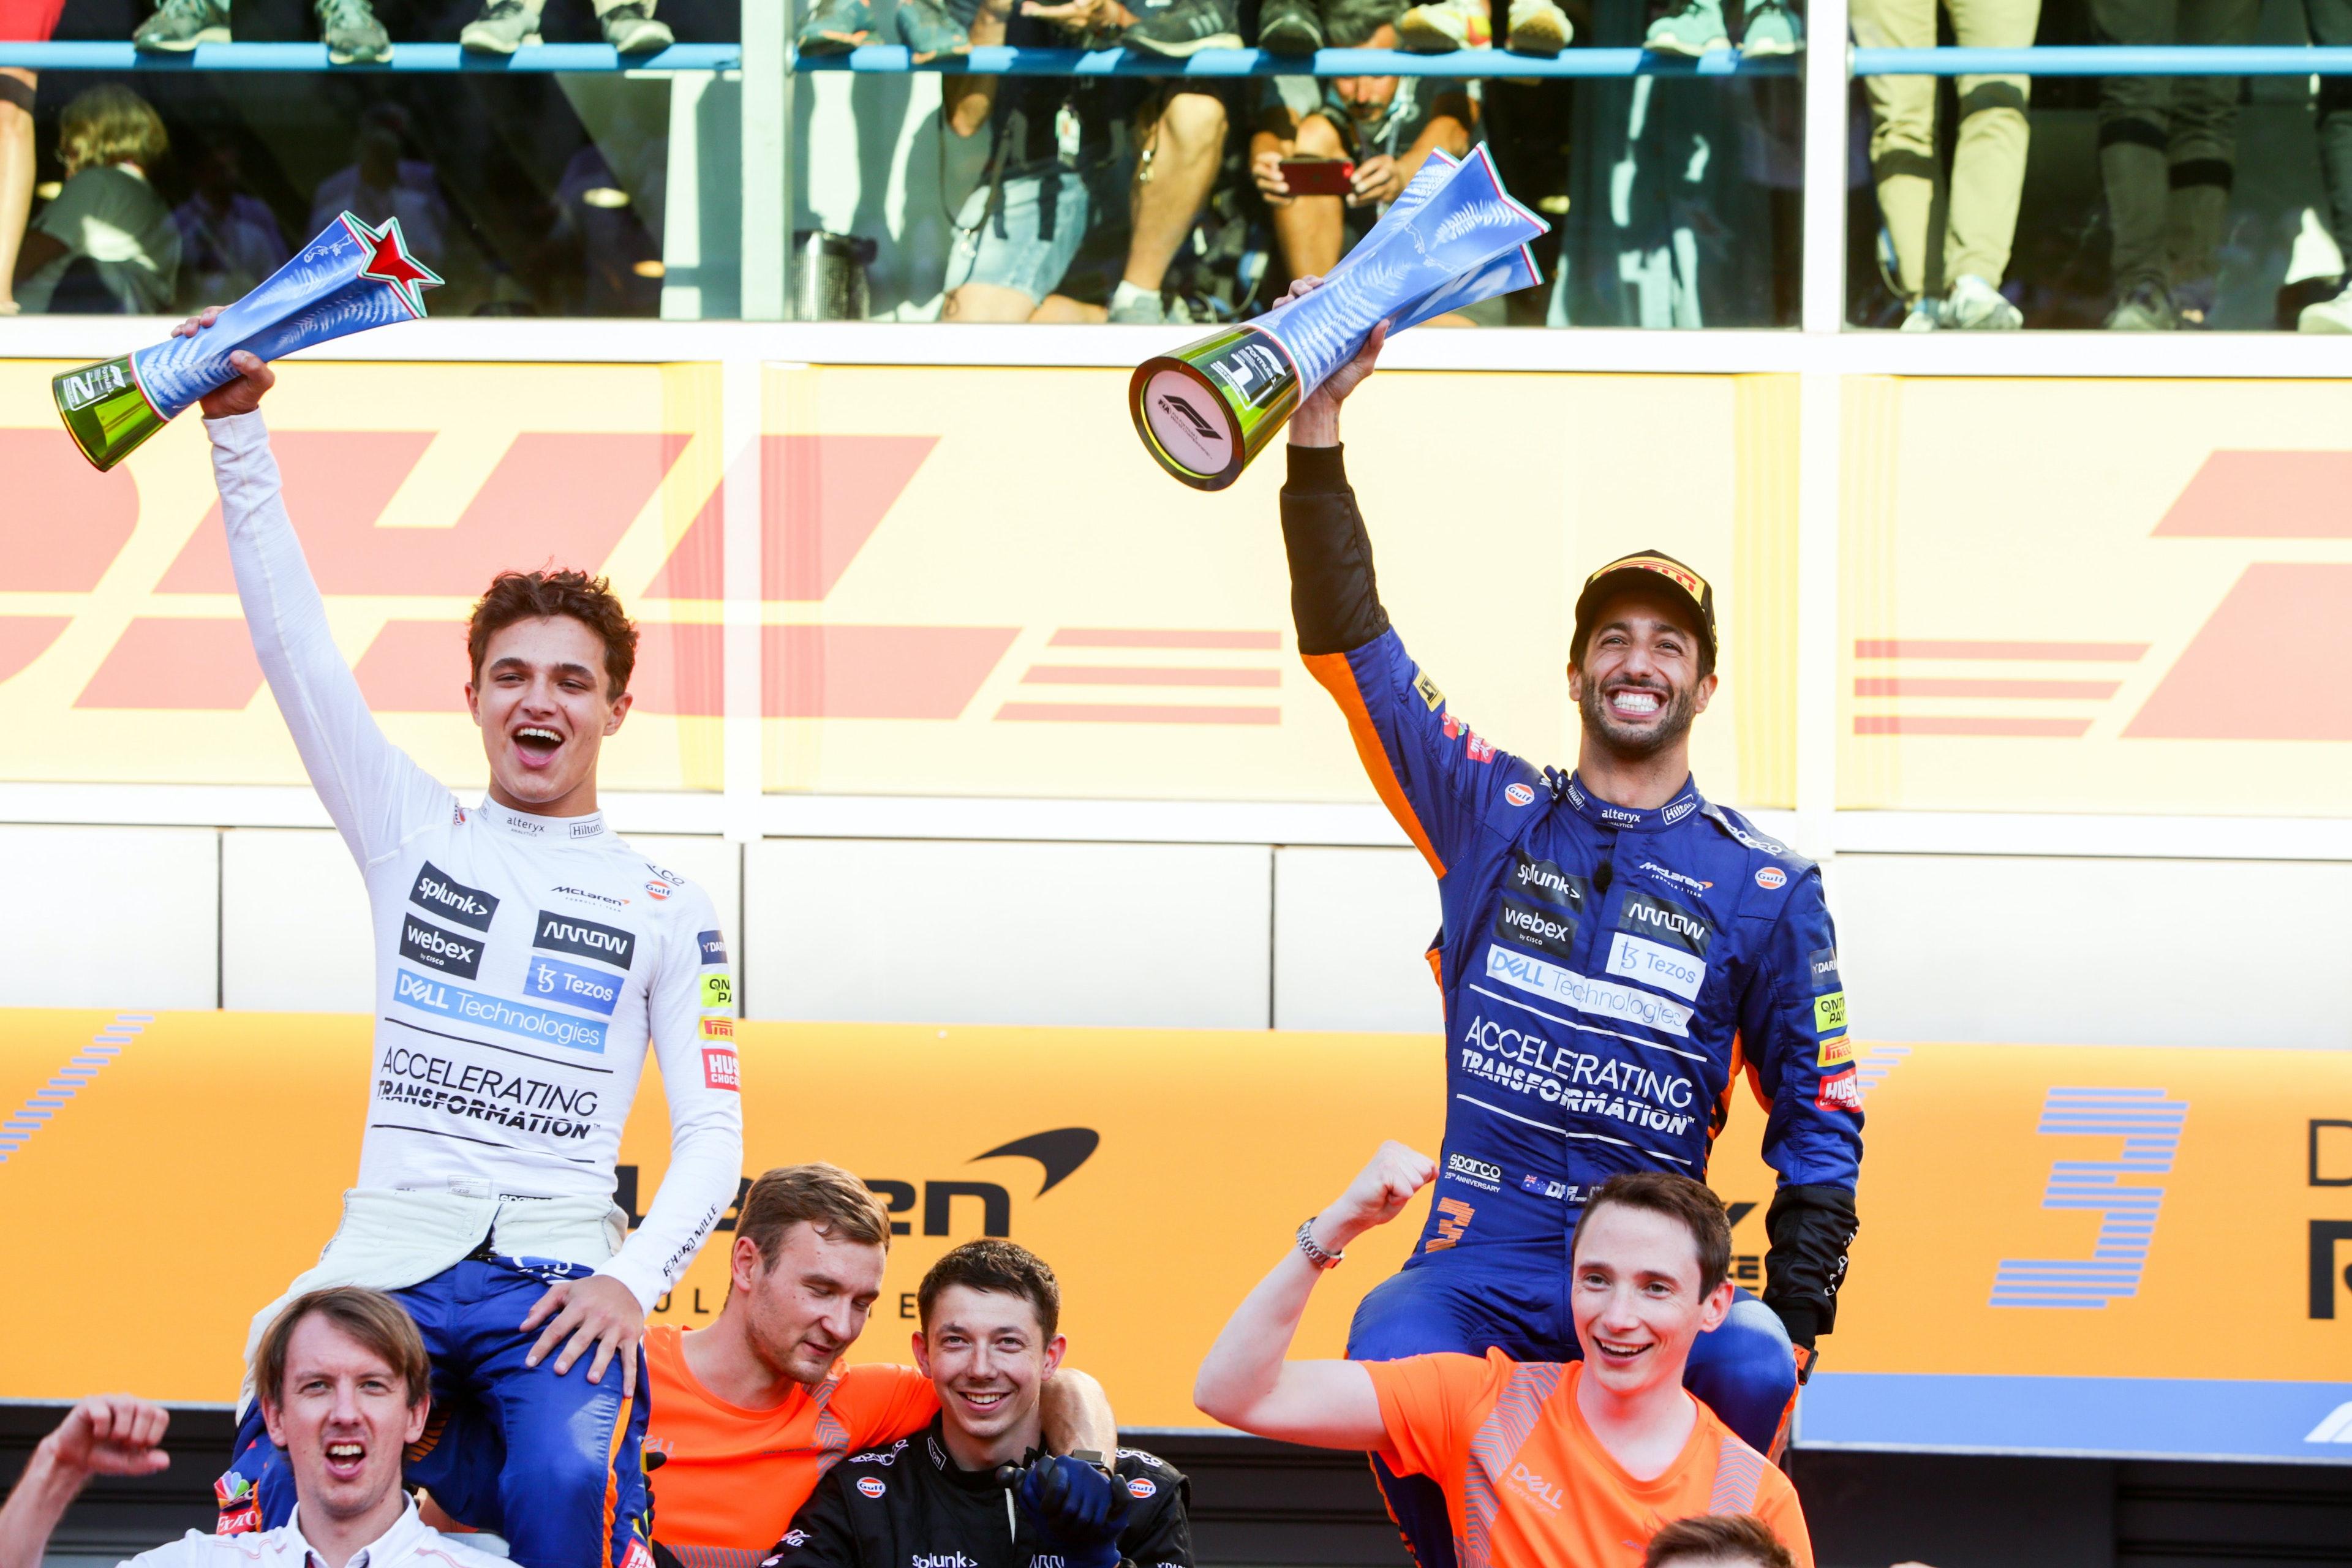 Daniel Ricciardo i Lando Norris - Formuła 1 - GP Włoch - Monza